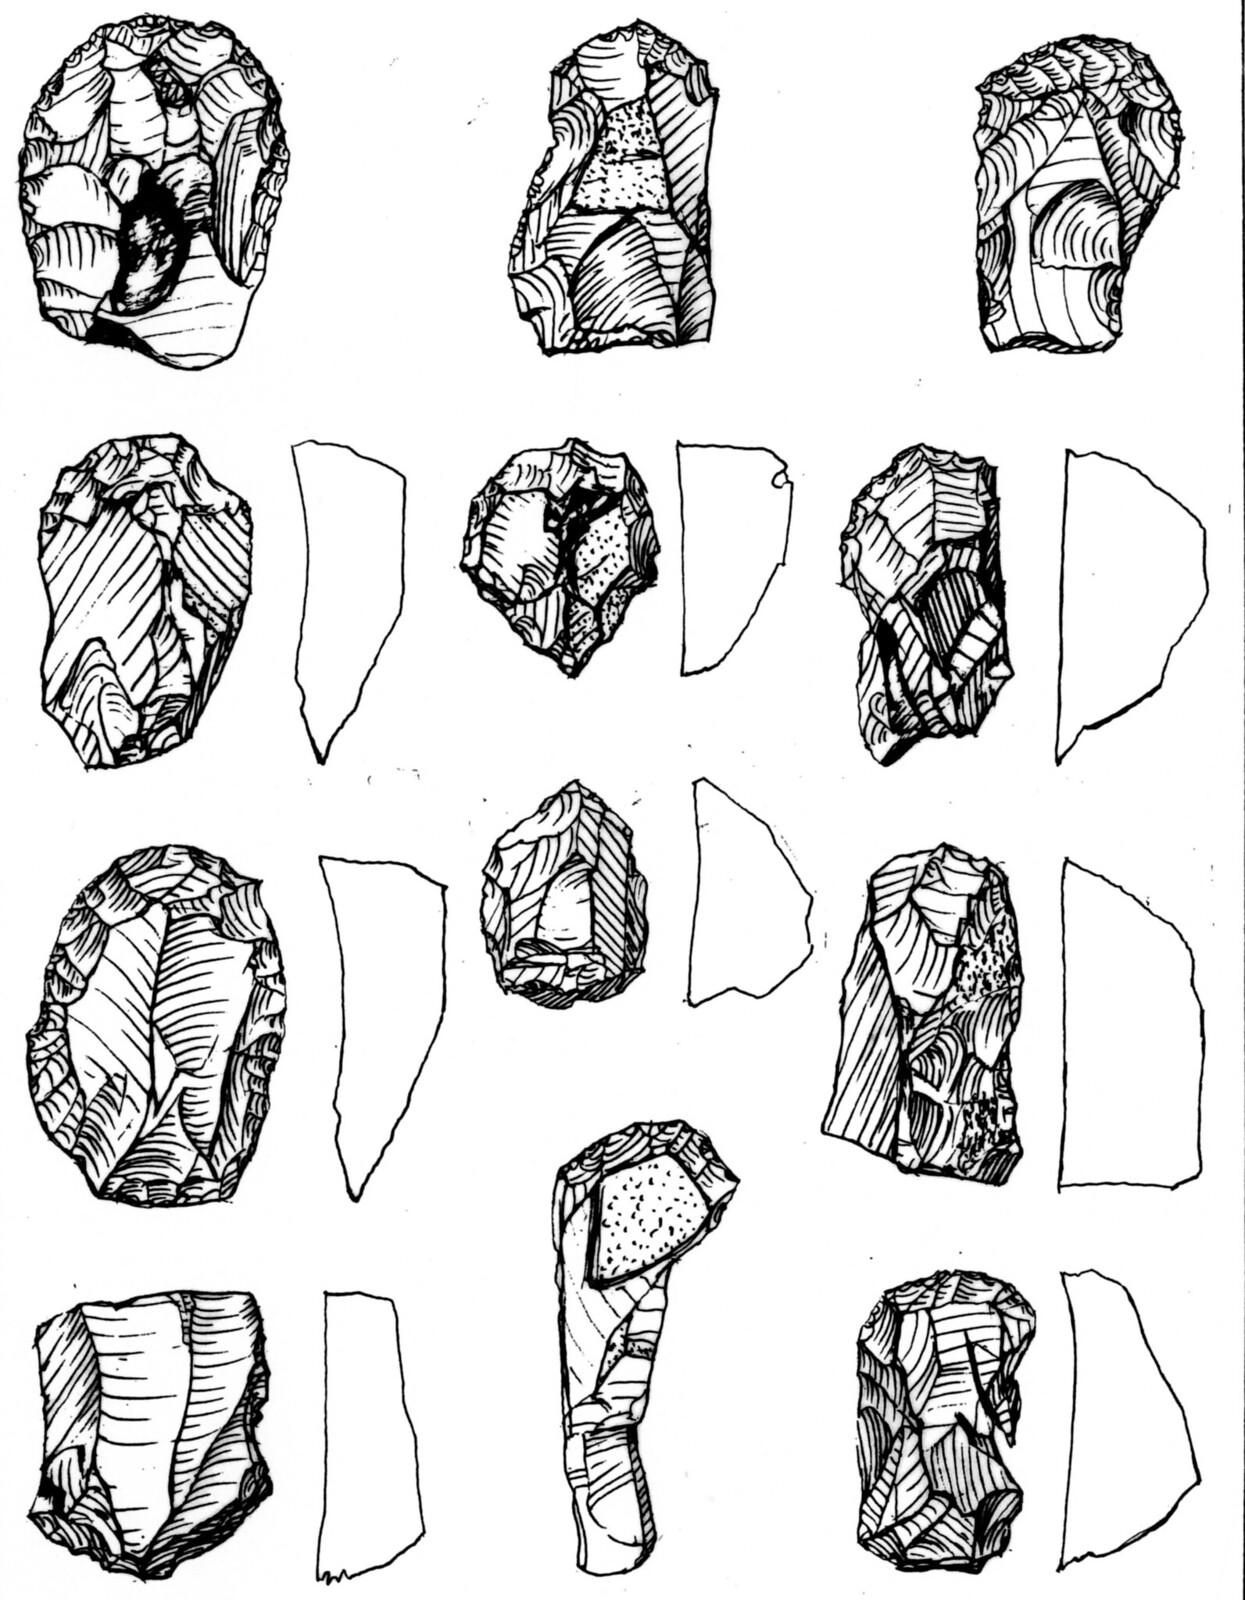 Acsa-Rovnya Aurignacian Figure 8.